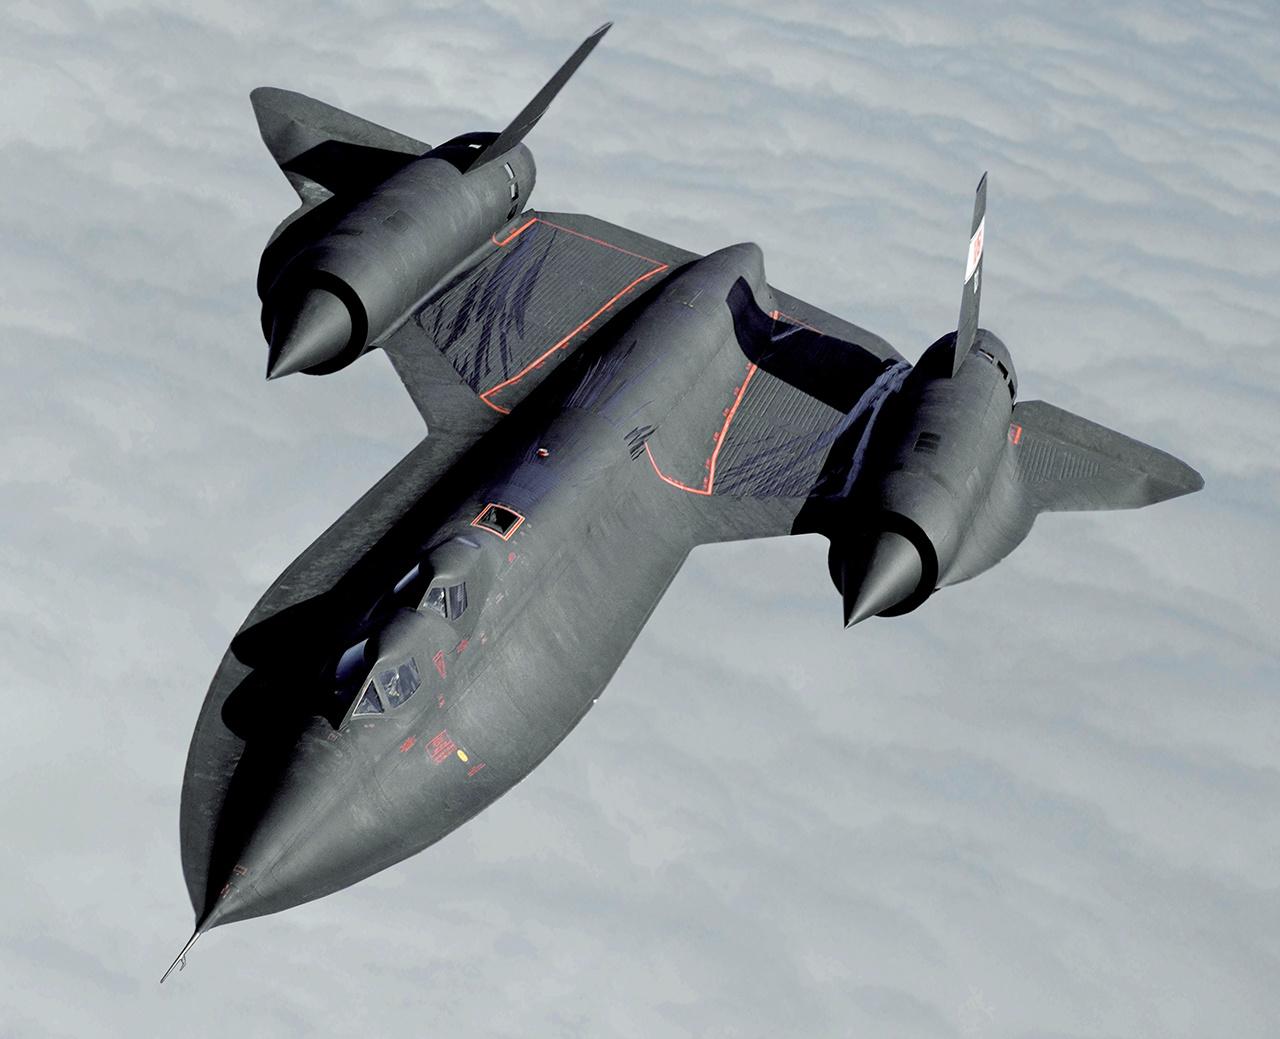 1. Lockheed SR-71 Blackbird